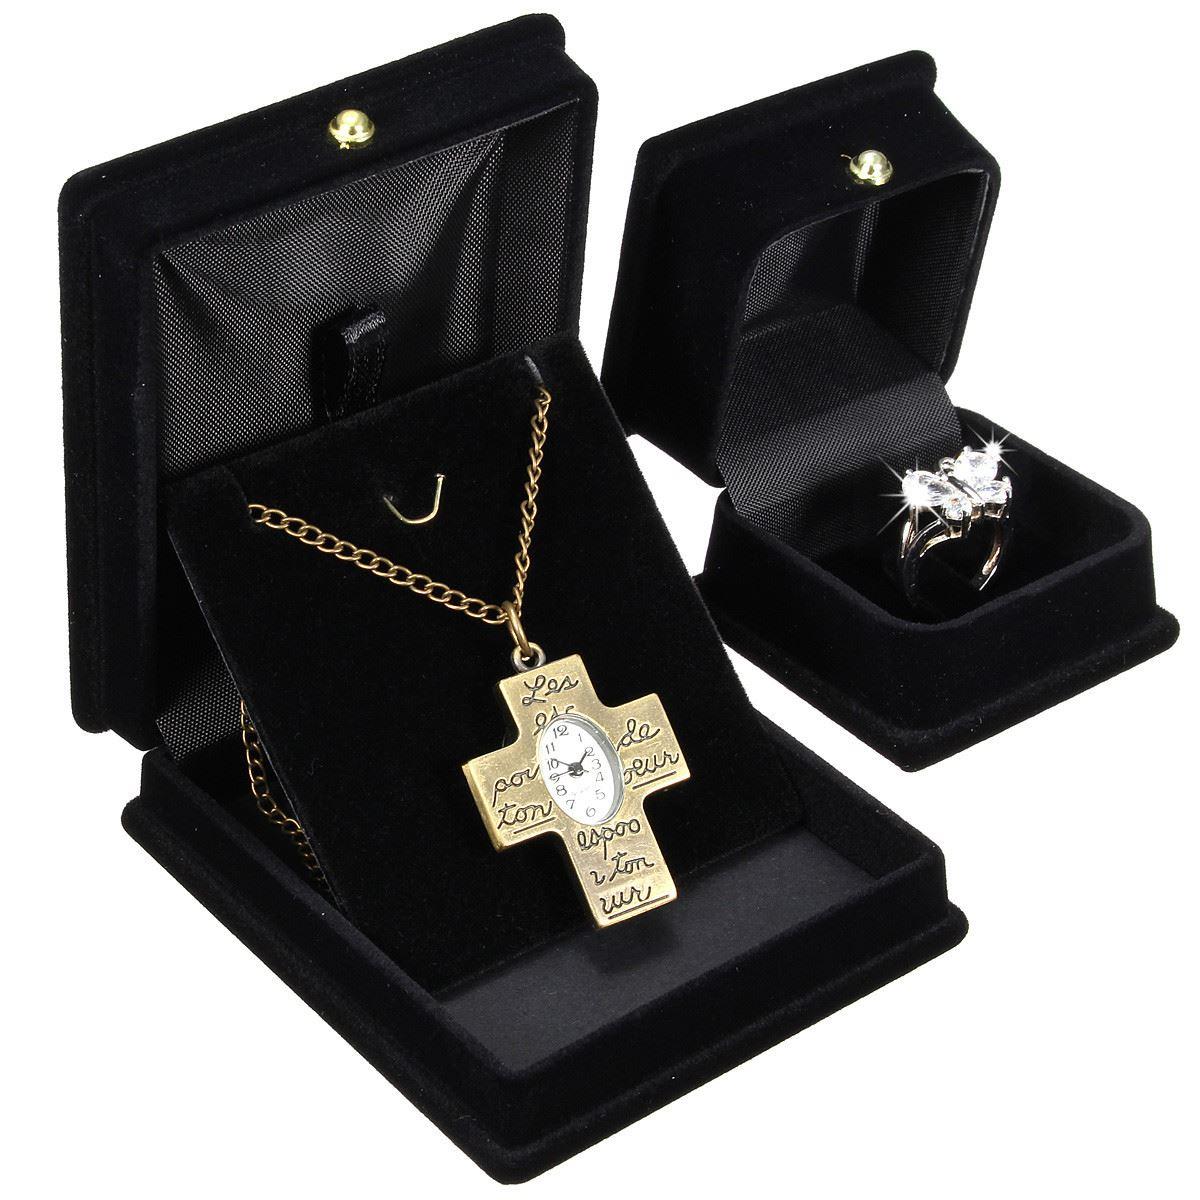 2016 New Design Jewelry Organizer Gift Box Black Sofa